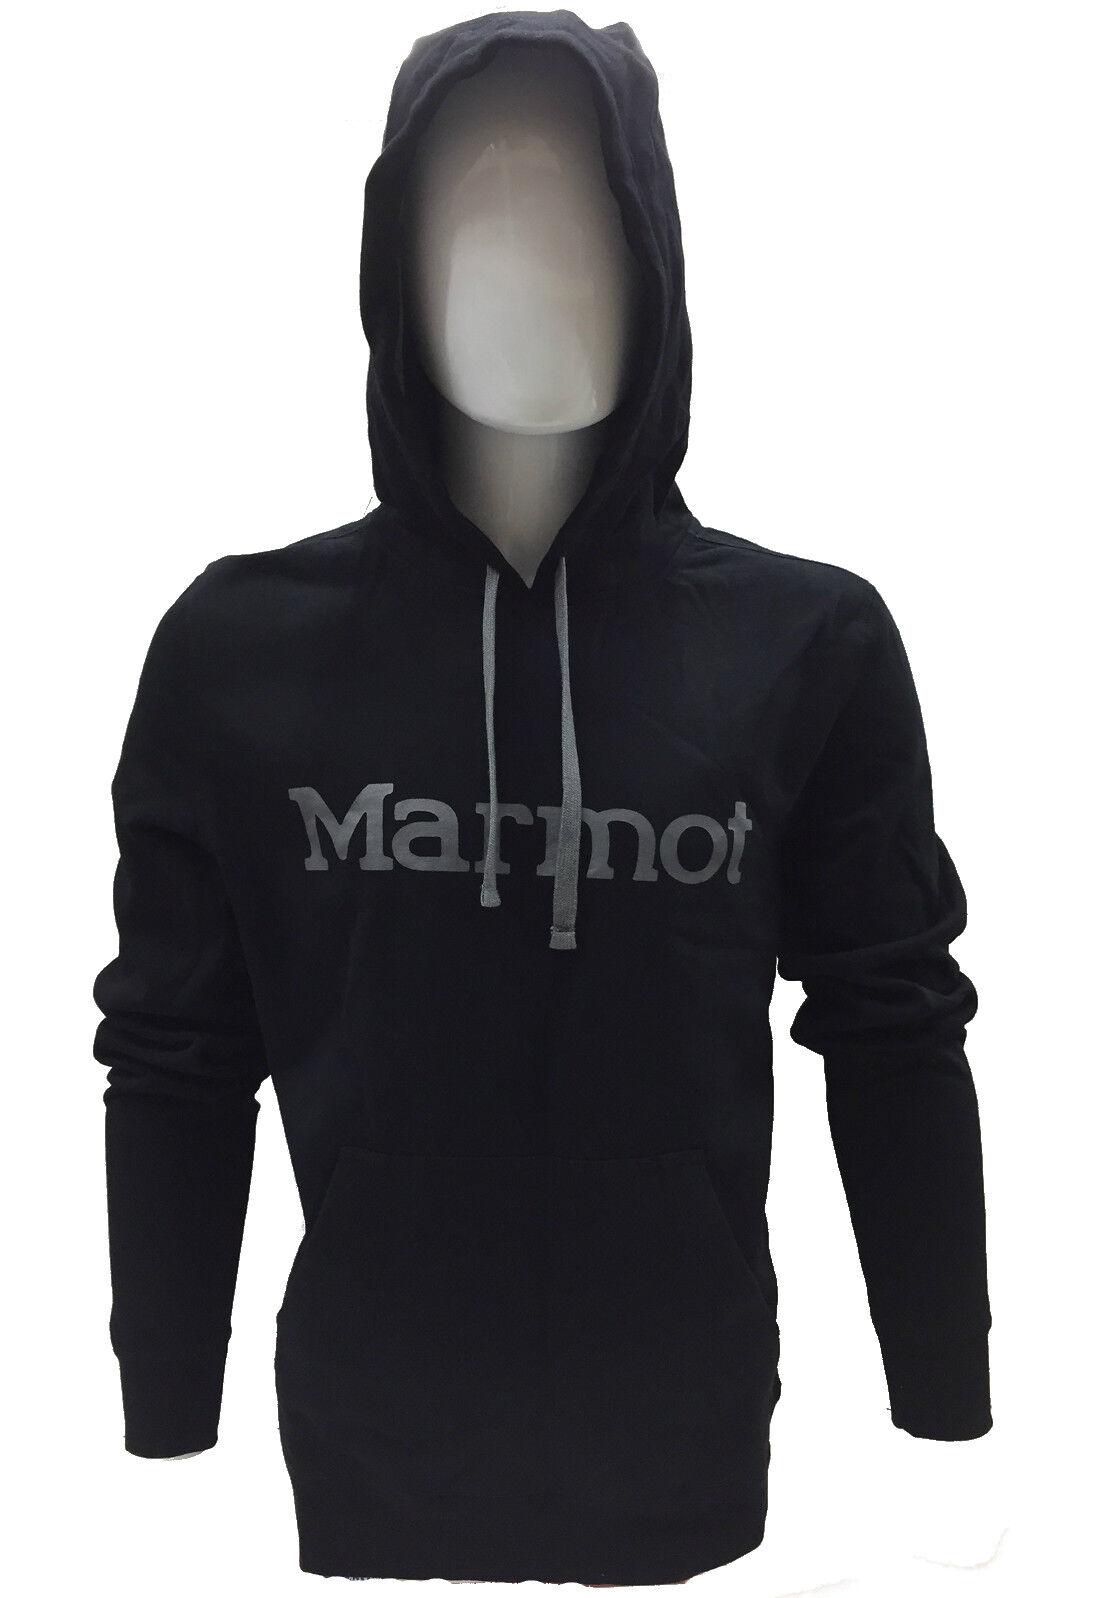 Marmot  Pul r Hoodie - 53640 (Multiple colors)  factory direct sales